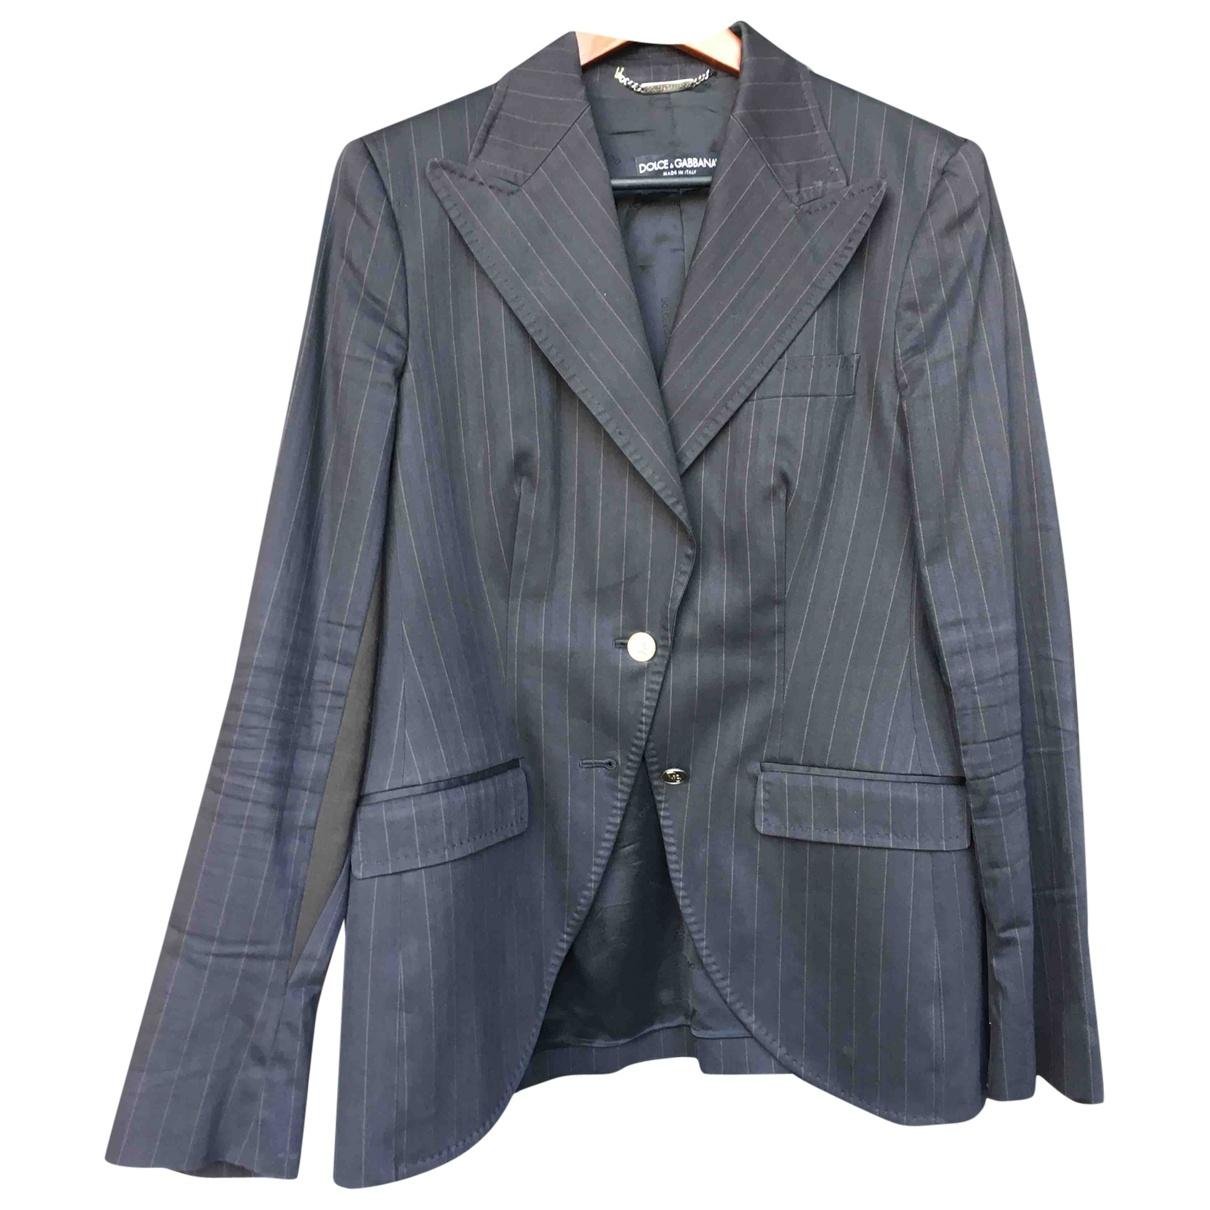 Dolce & Gabbana \N Cotton jacket for Women 46 IT